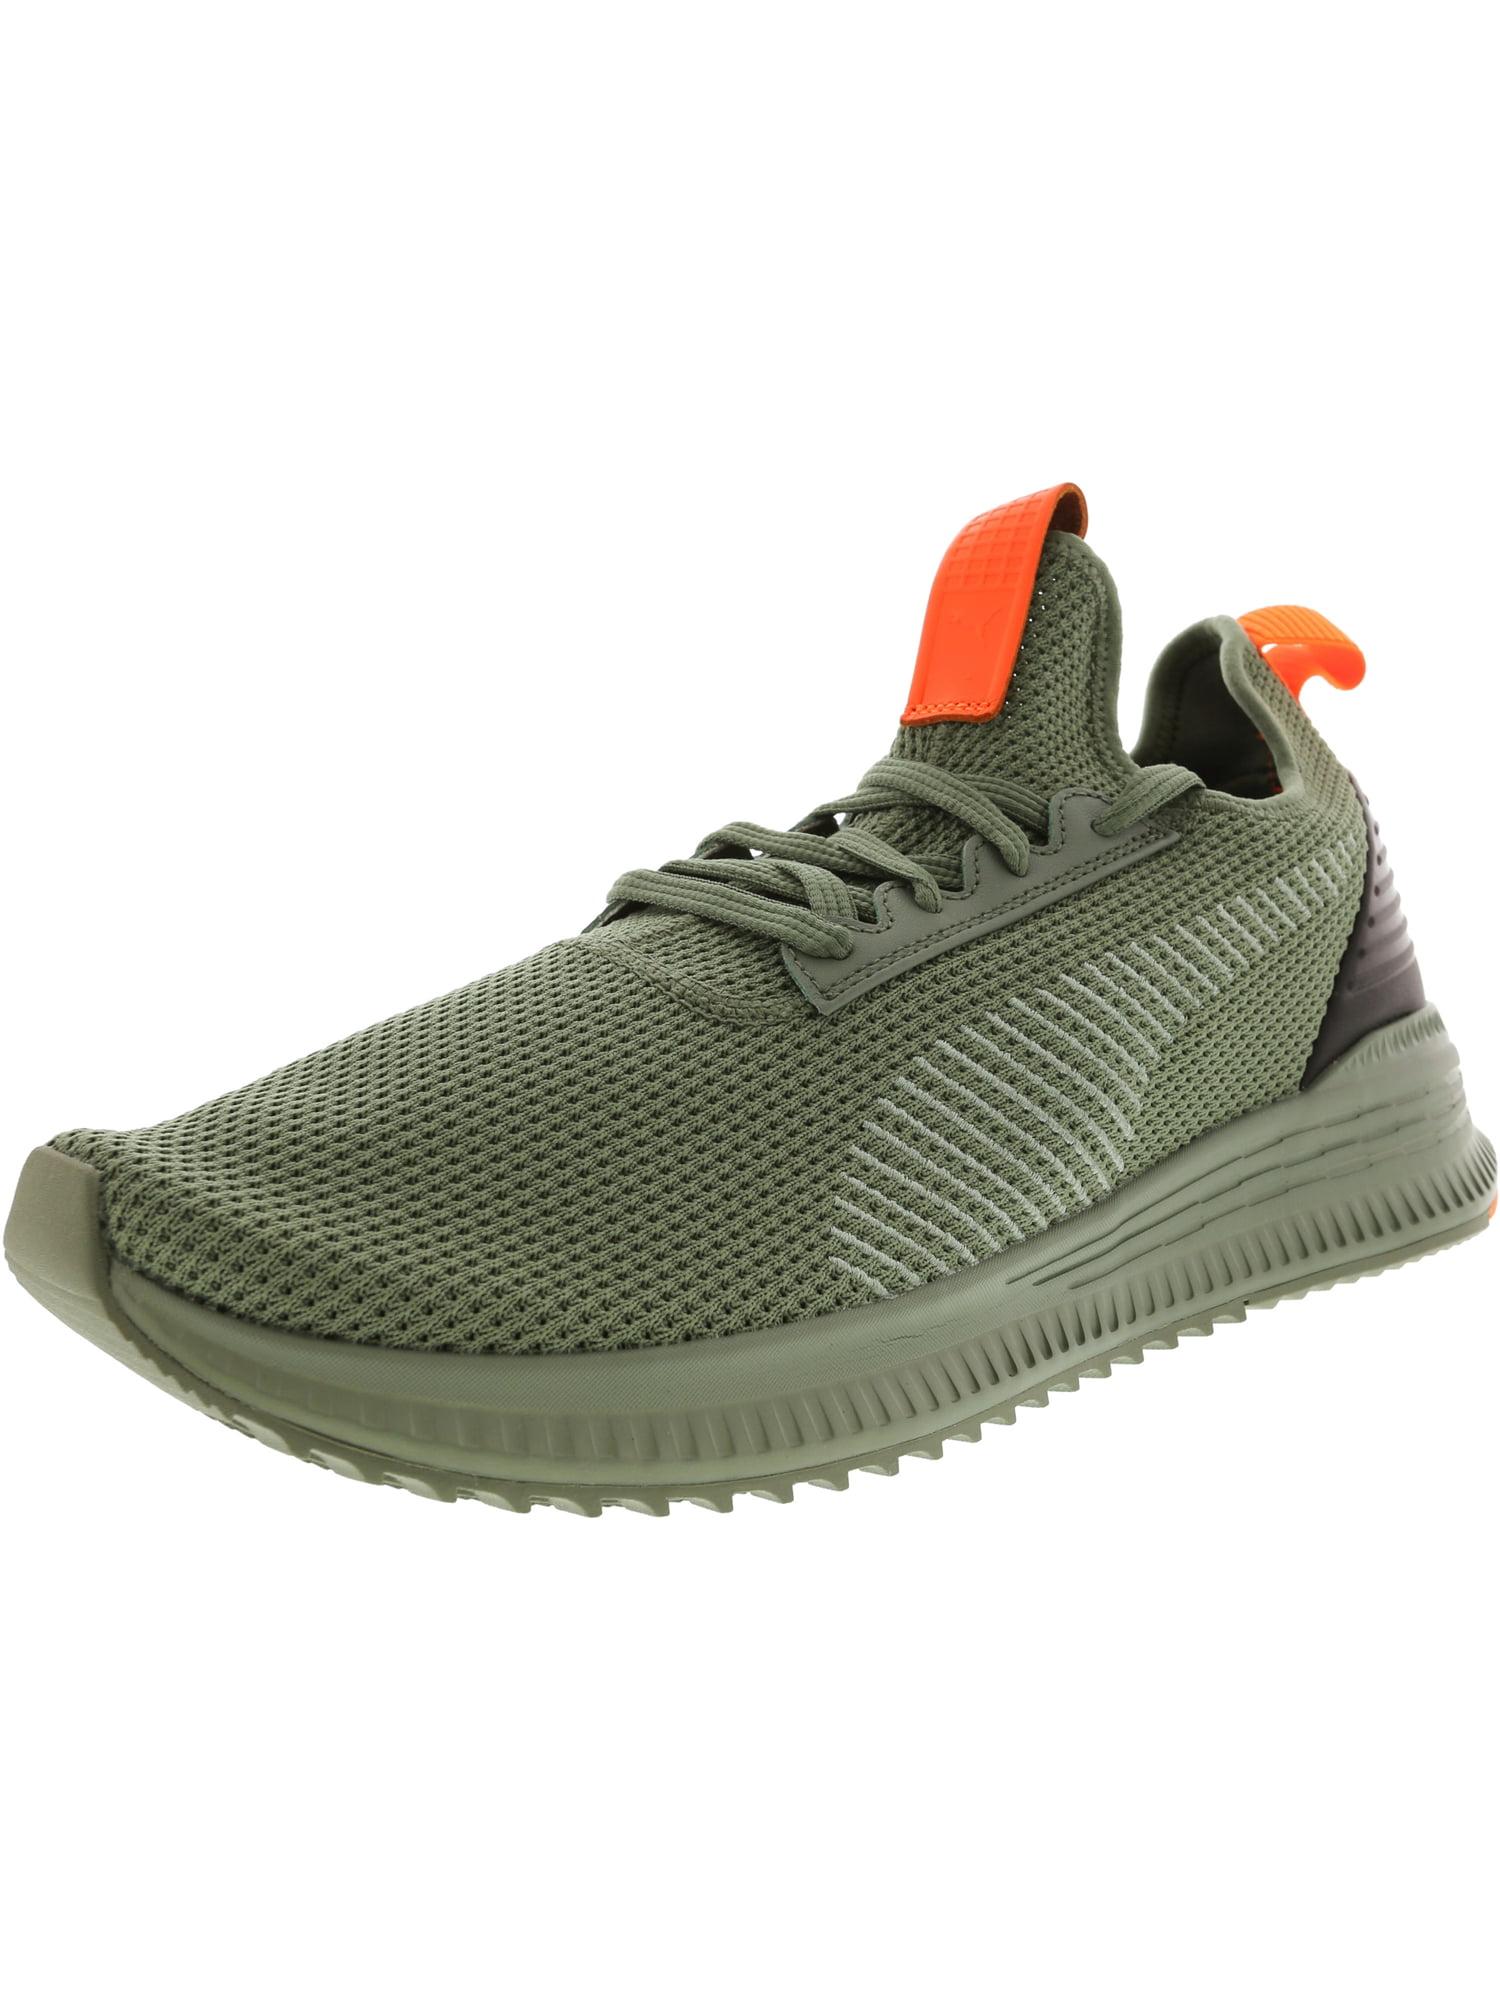 Puma Men's Avid Fof Light Wreath / Black Sharp Orange Ankle-High Running Shoe - 13M